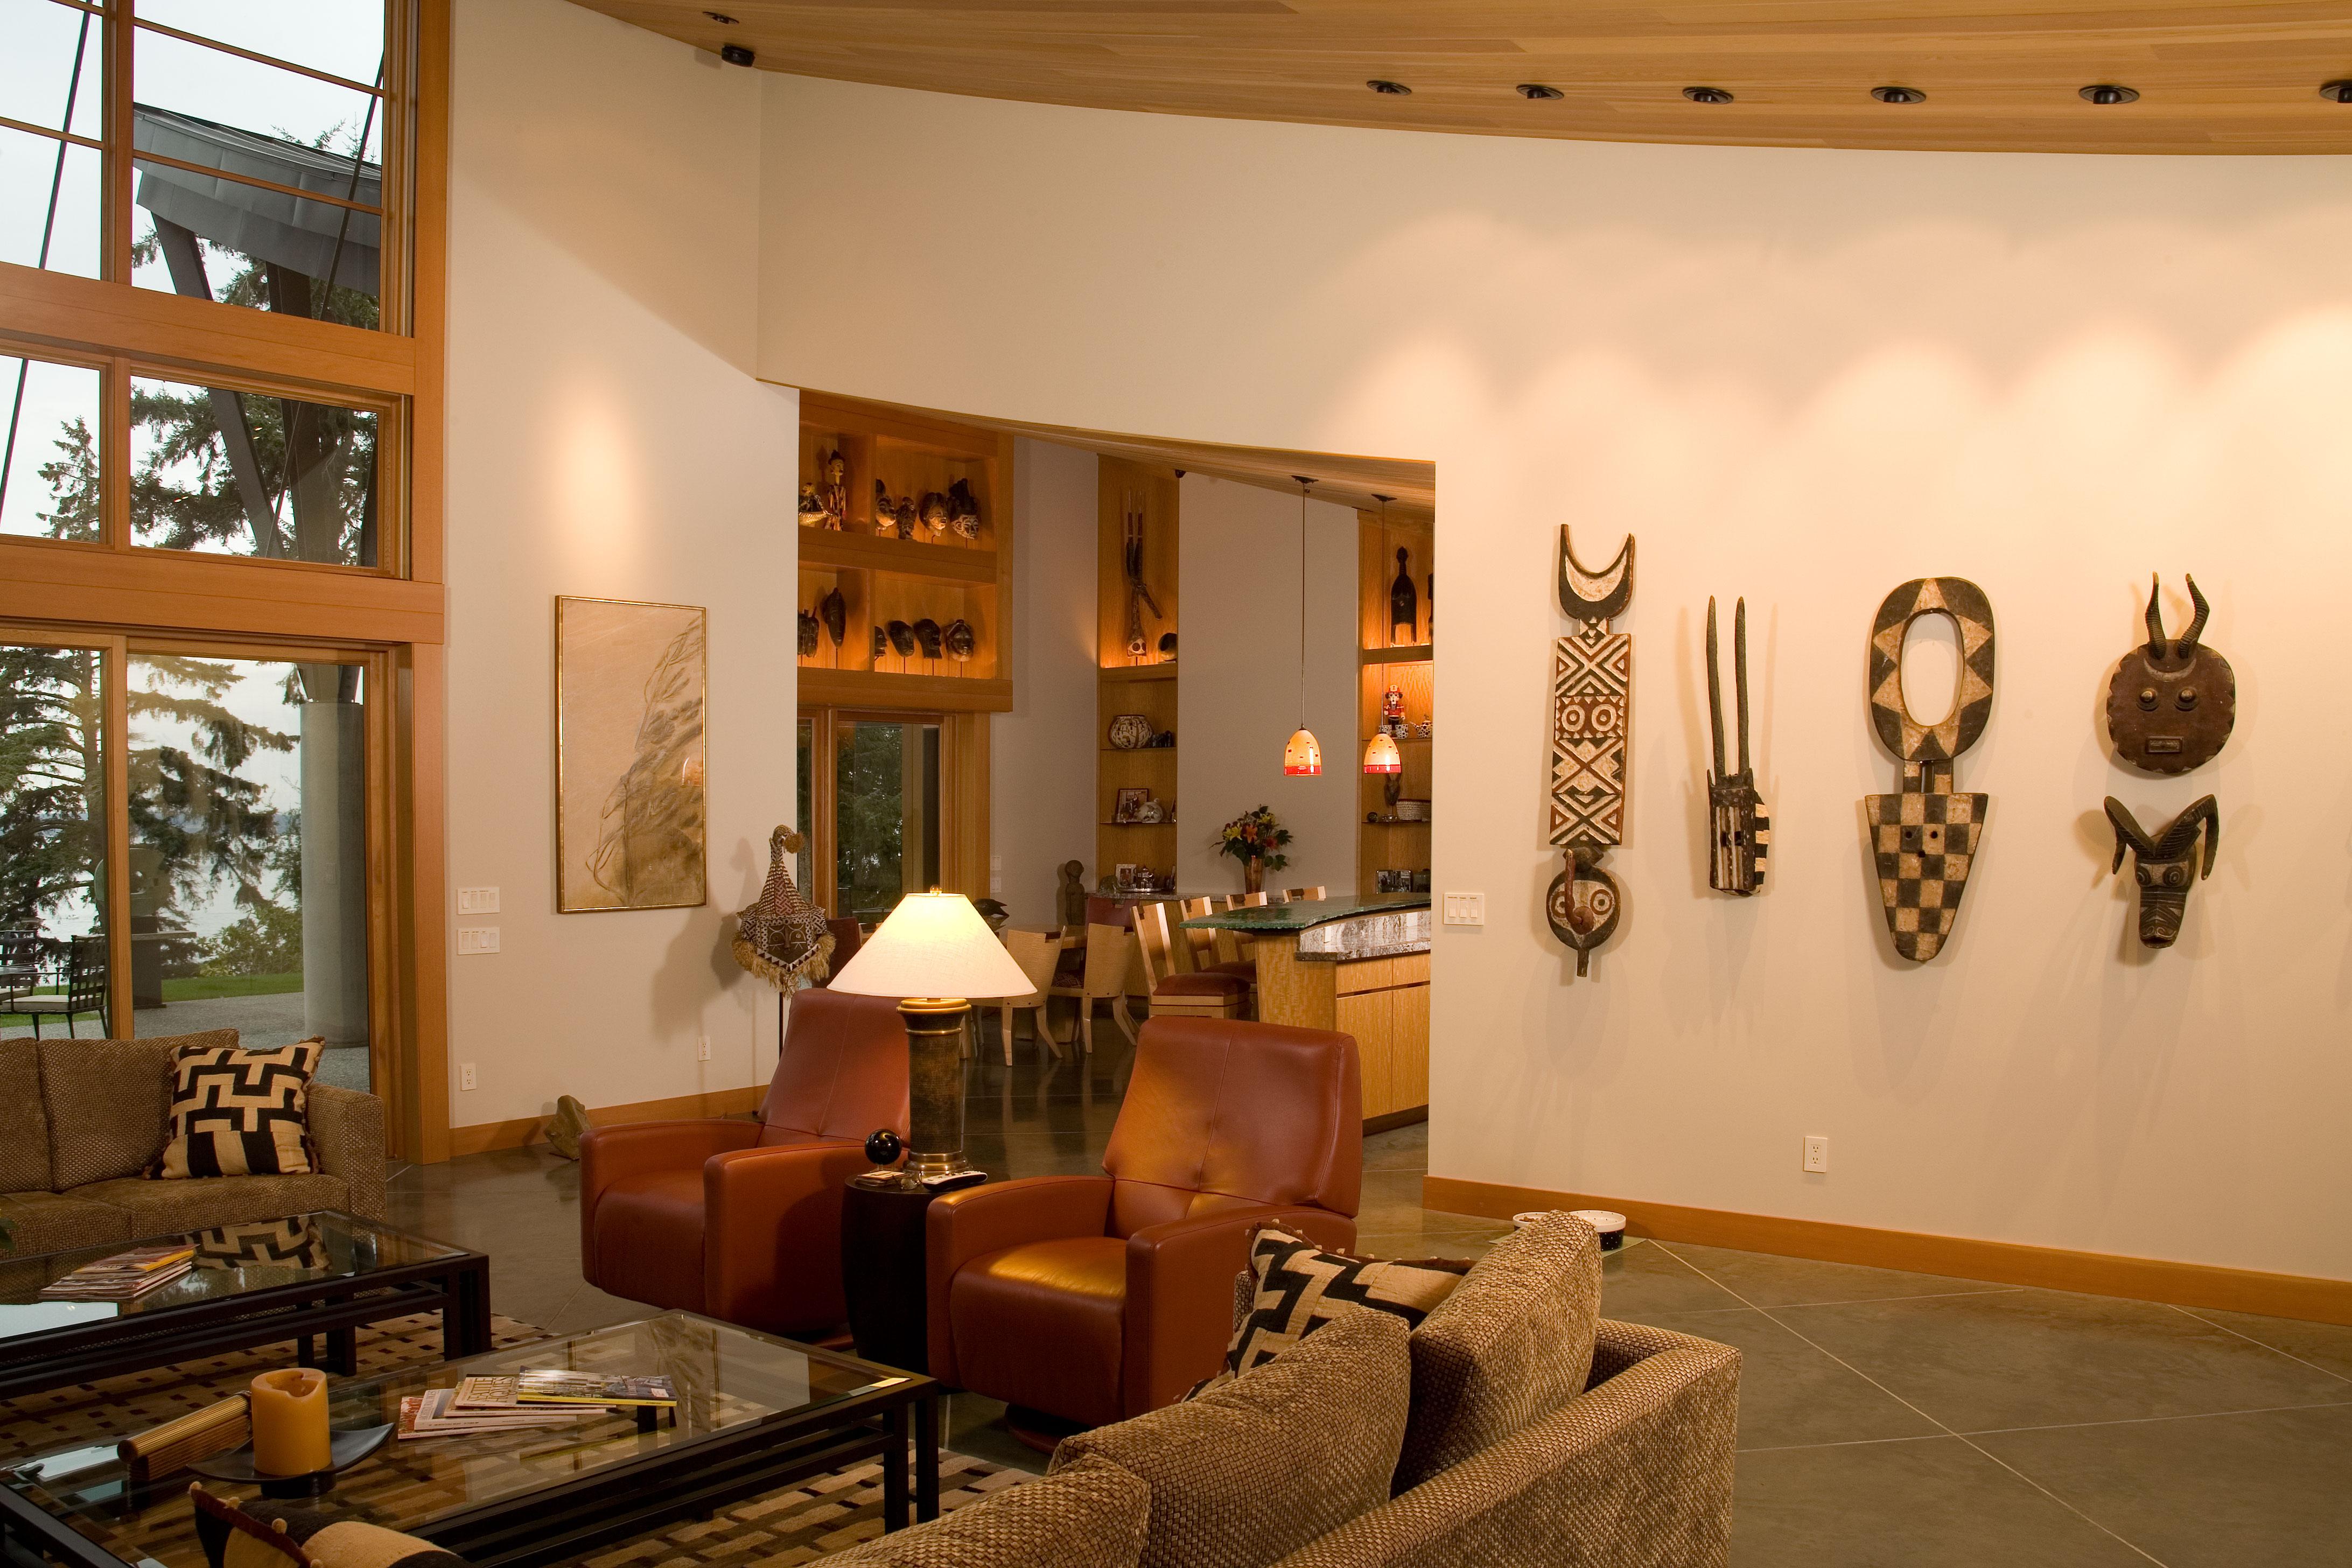 Smuggler's Cove Remodel Interior